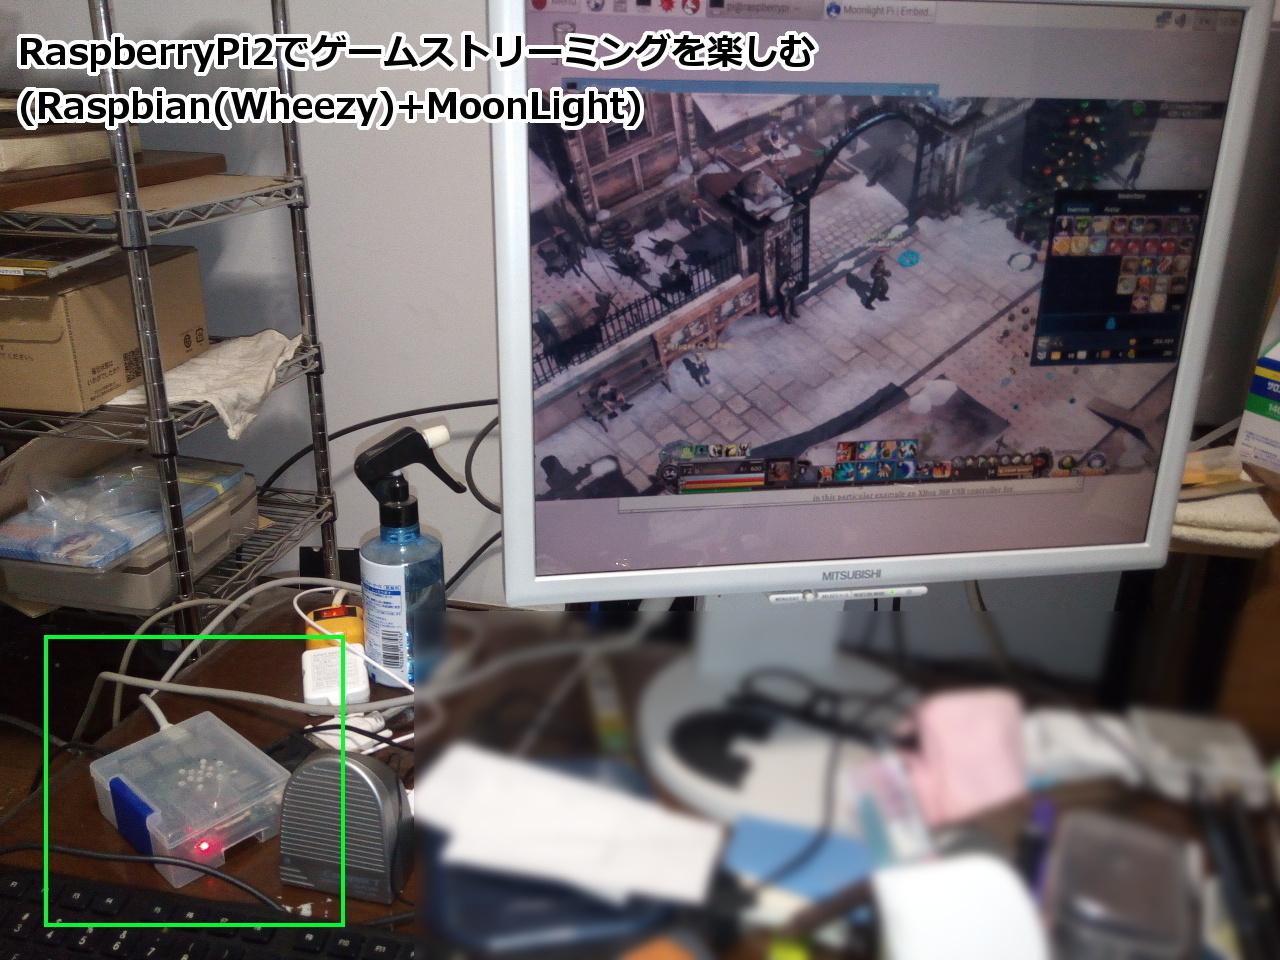 RaspberryPi2でゲームストリーミングを楽しむ